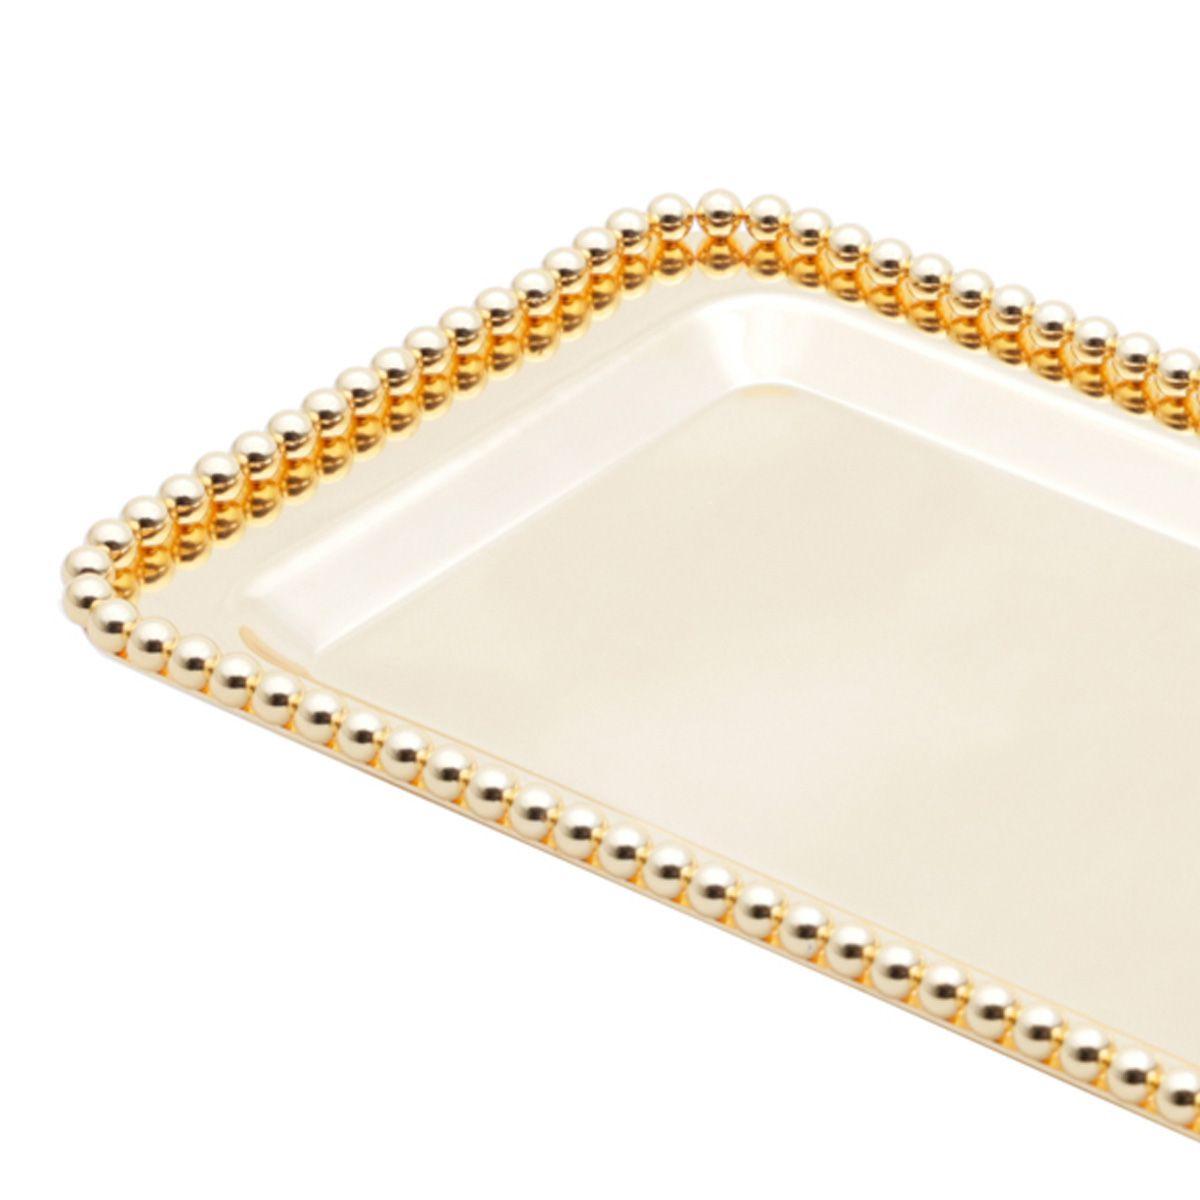 Bandeja retangular 25 x 15,5 cm de zamac dourado Balls Lyor - L3813